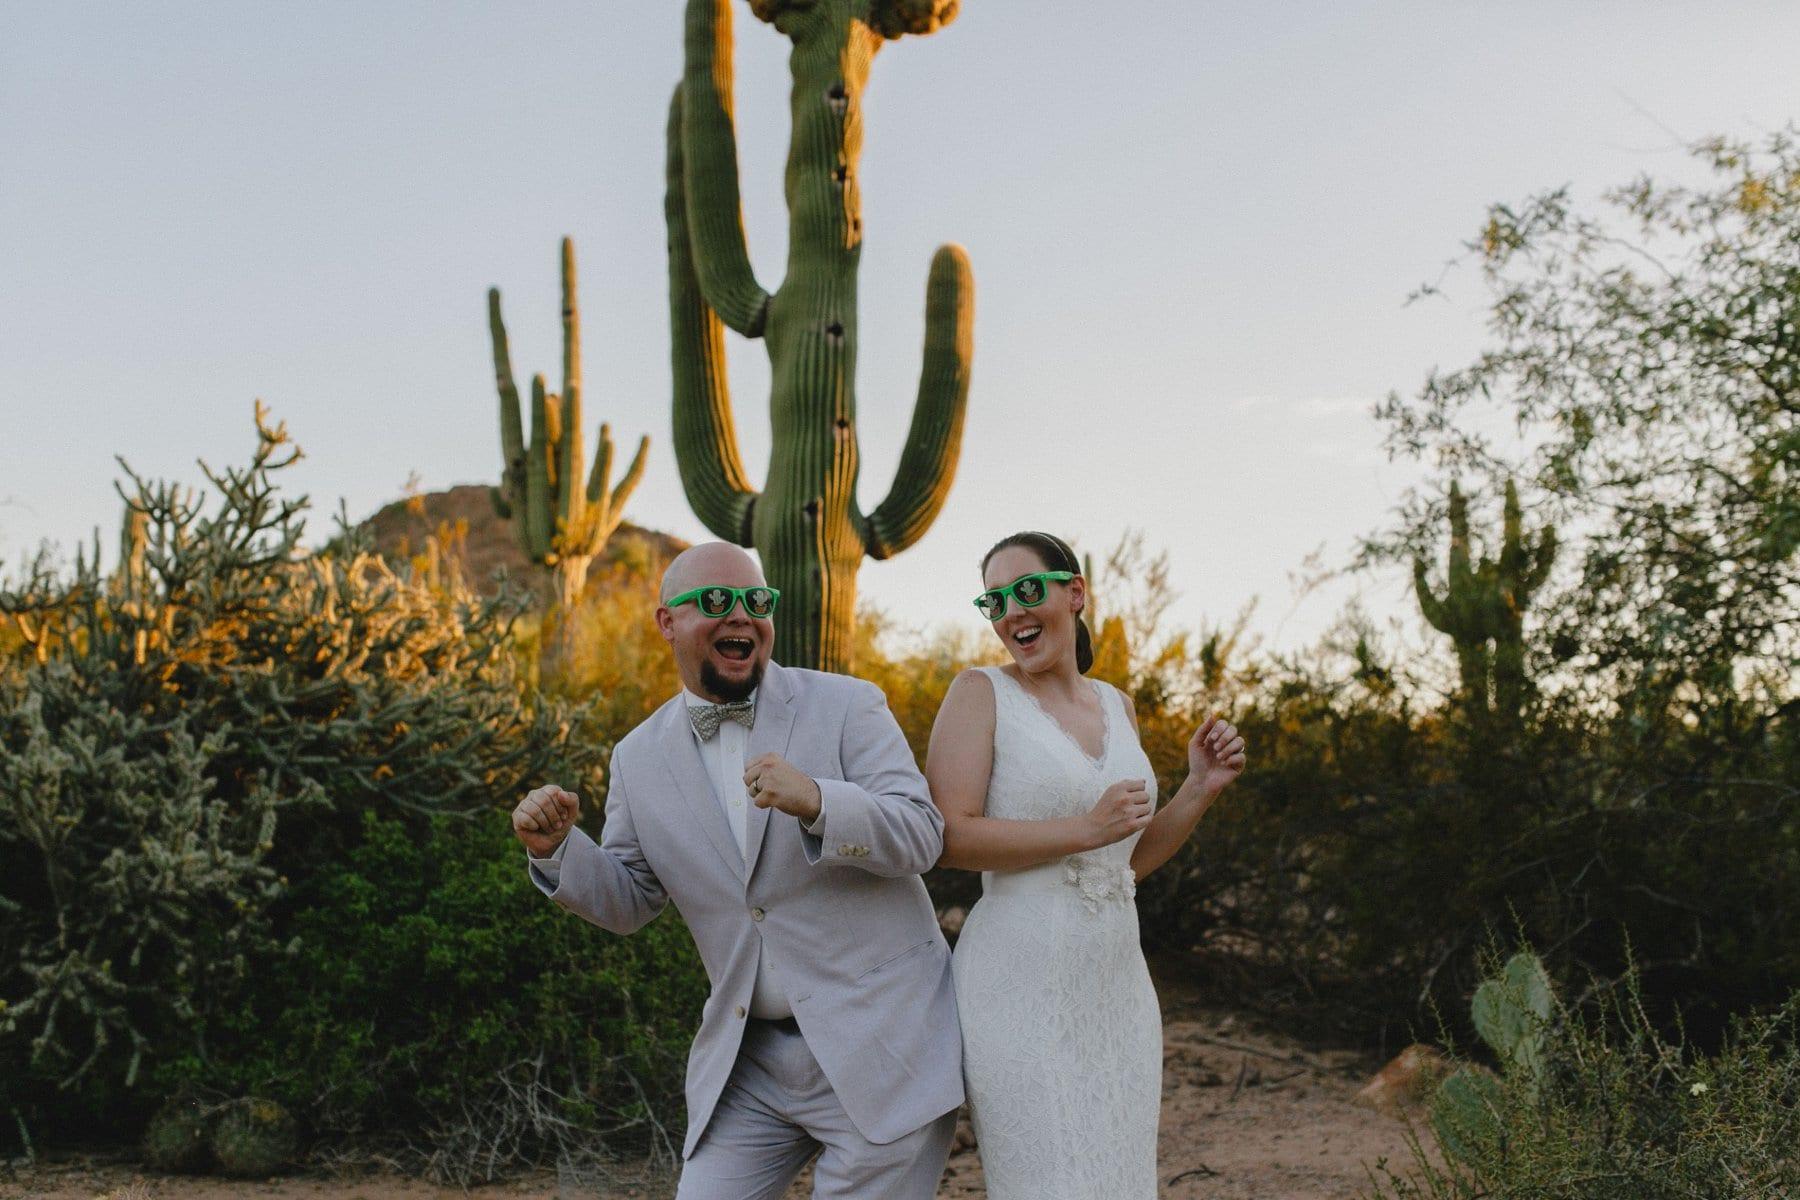 happy fun goofy joyful wedding photos with cactus sunglasses at Desert Botanical elopement